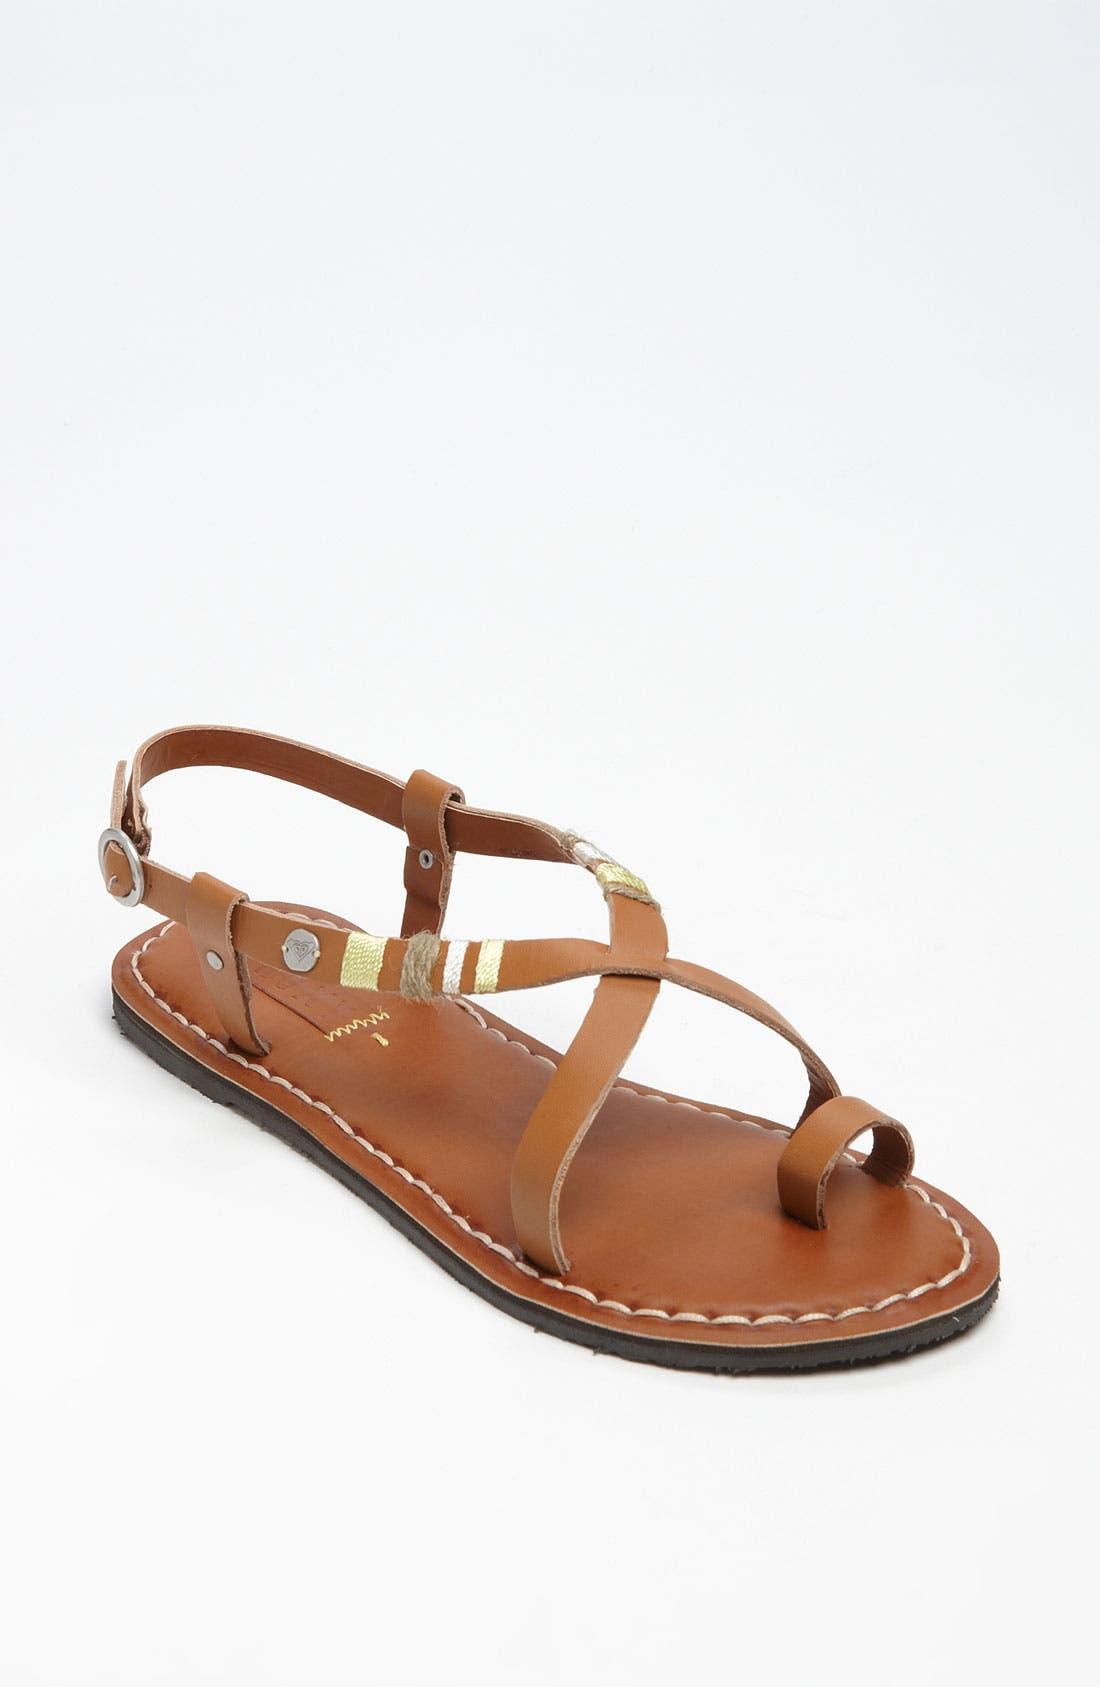 Alternate Image 1 Selected - Roxy 'Mojito' Sandal